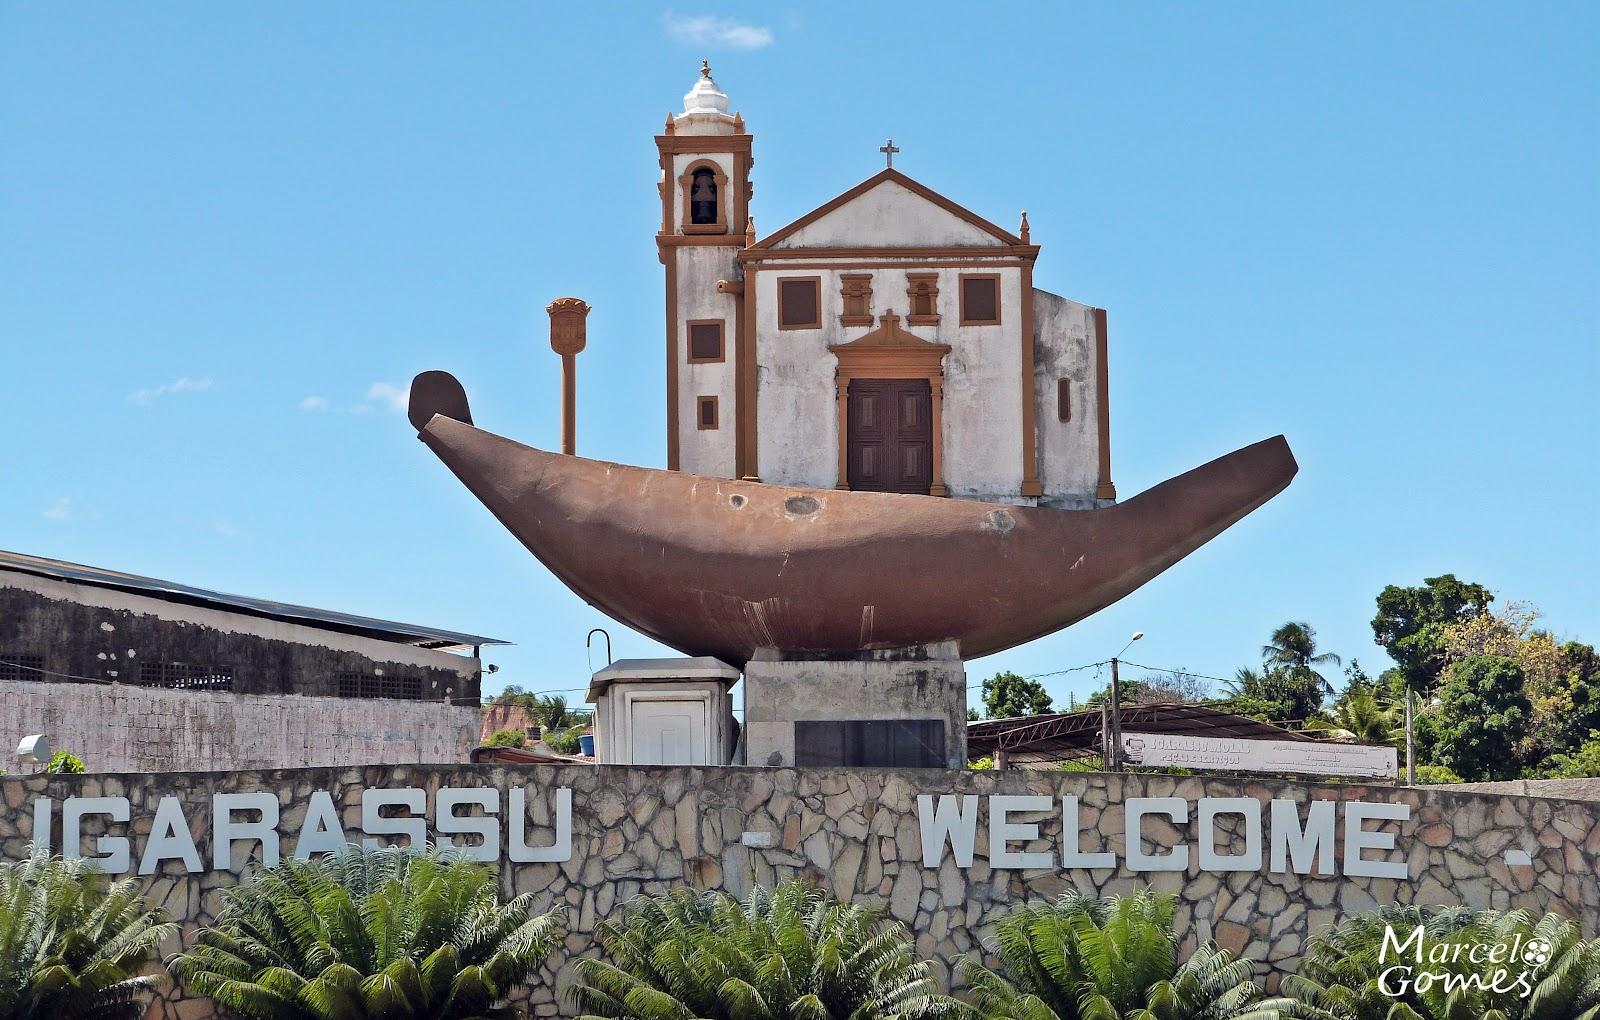 Floricultura Igarassu - Imagem 1